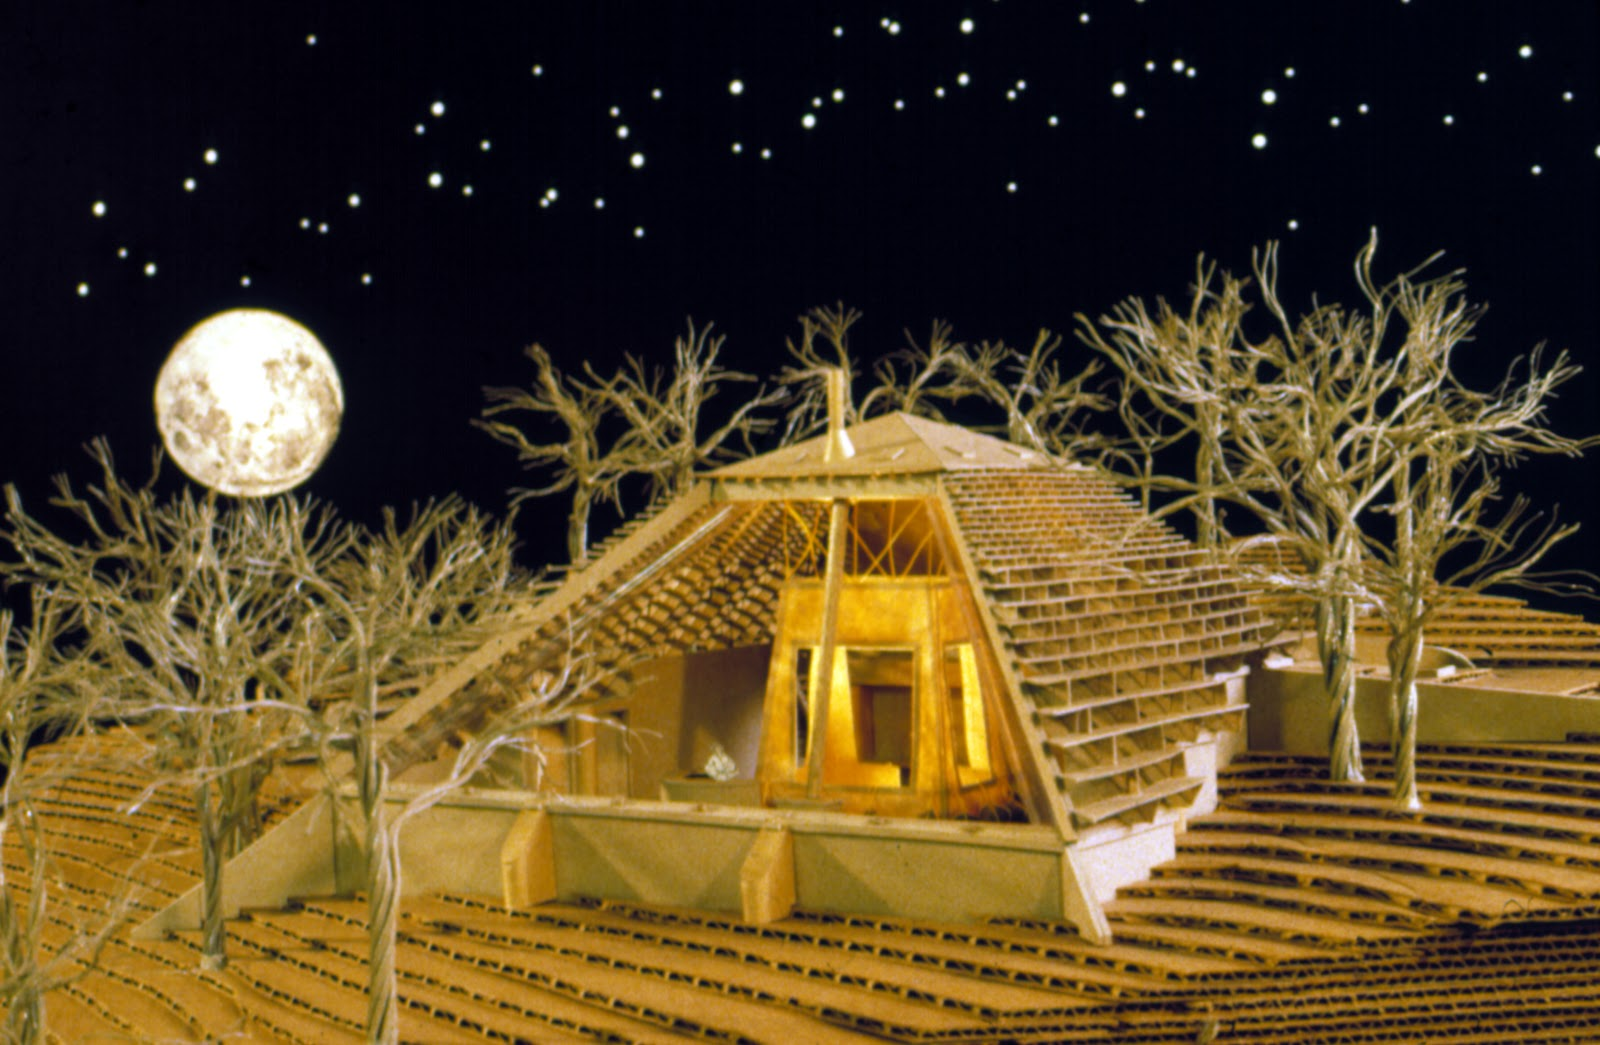 OBIE BOWMAN ARCHITECT FAIA MY JOURNAL: December 2012